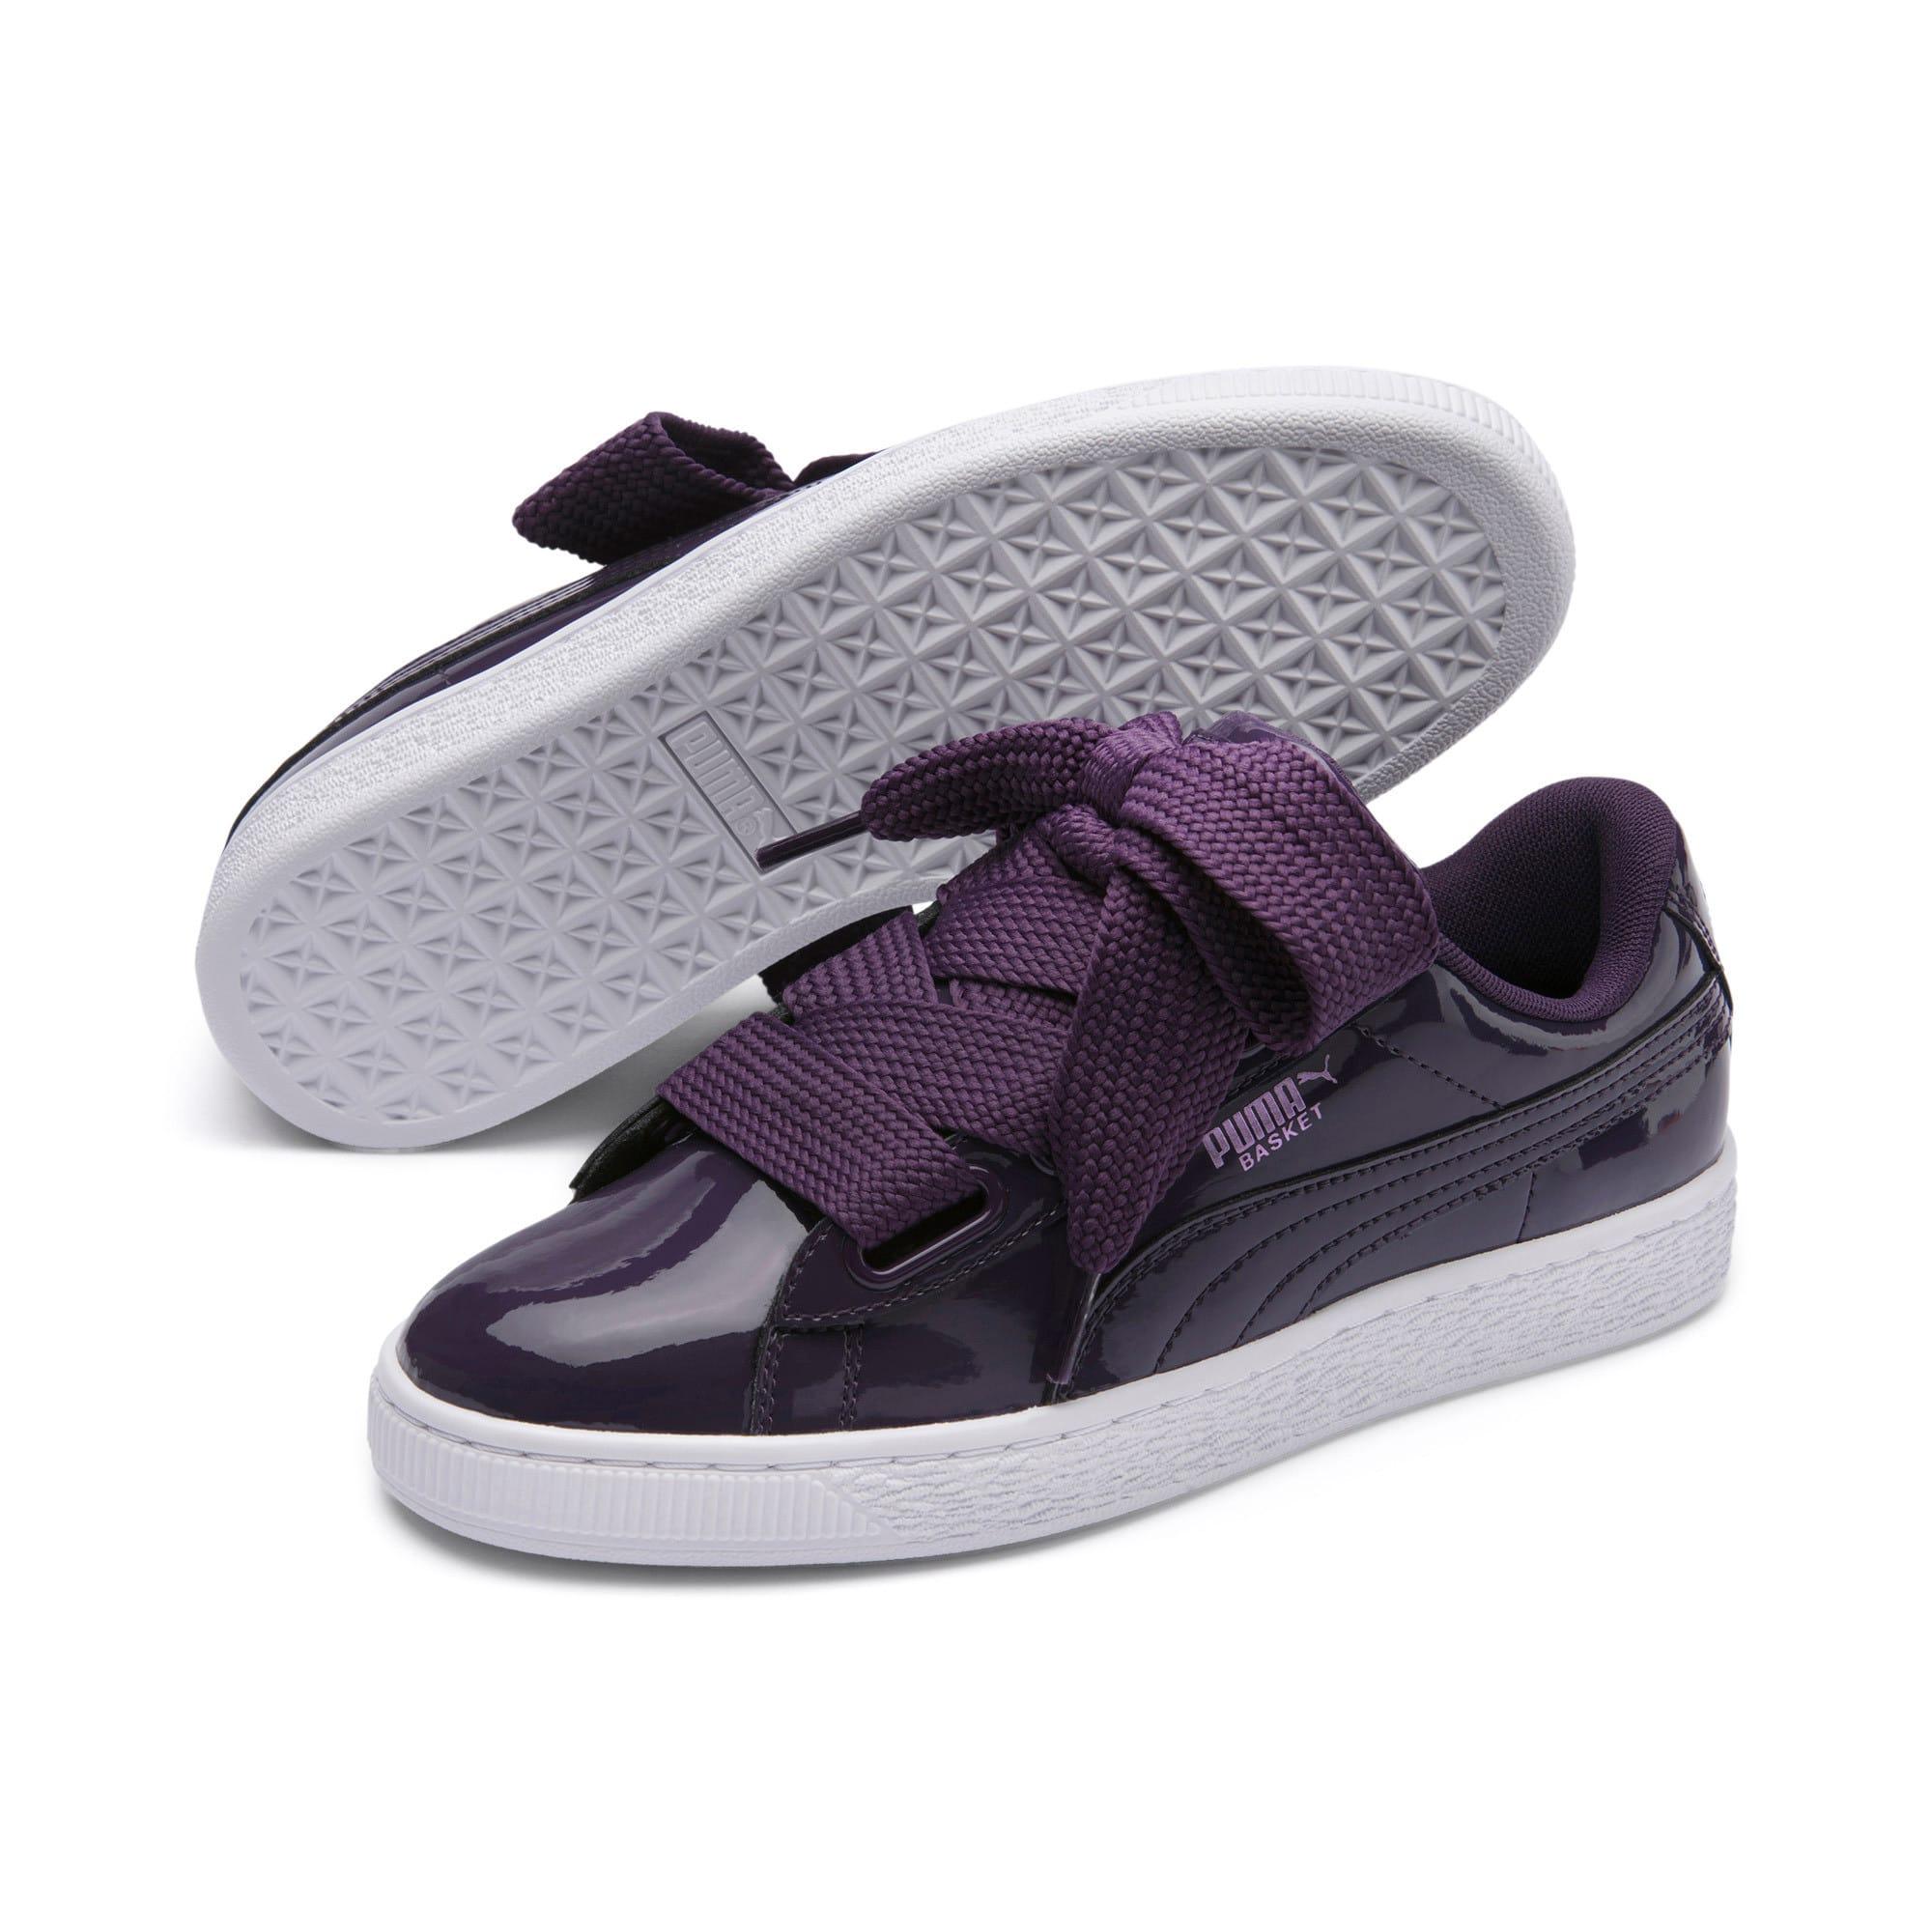 Thumbnail 2 of Basket Heart Patent Women's Sneakers, Indigo-Puma White, medium